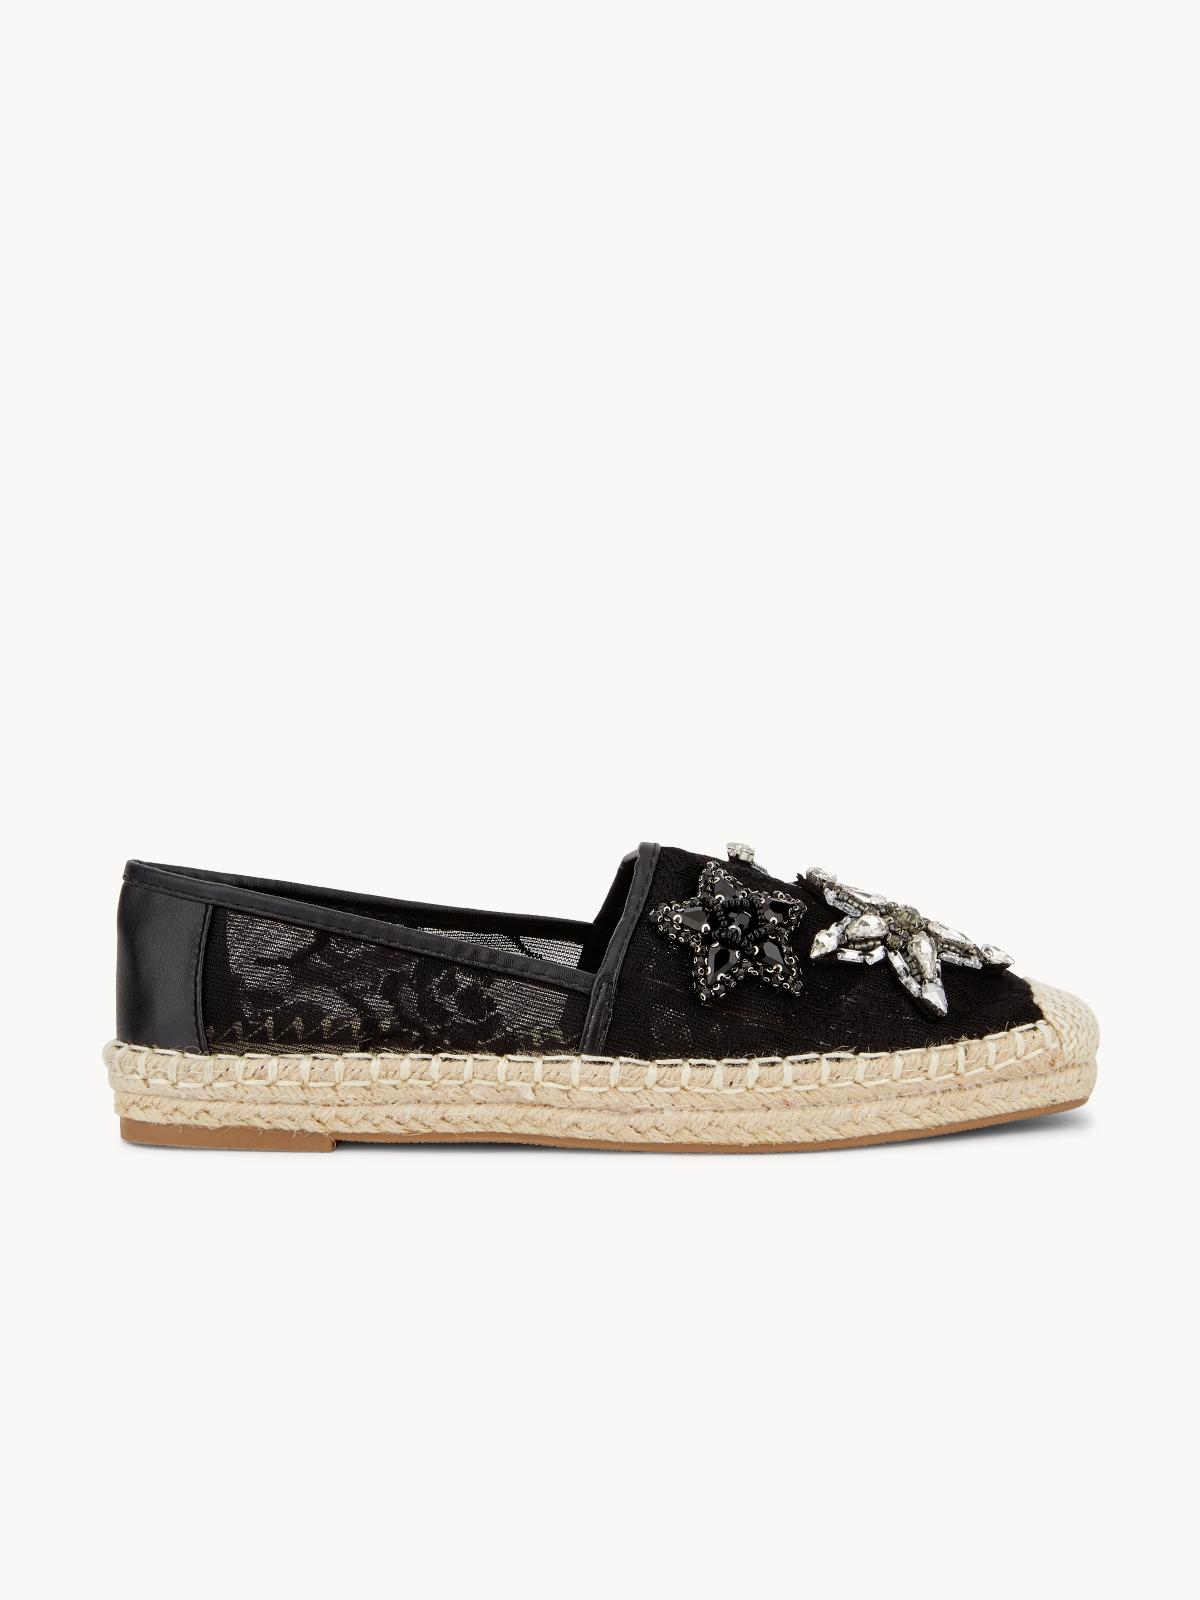 March Shoes Starfish Espadrilles Black